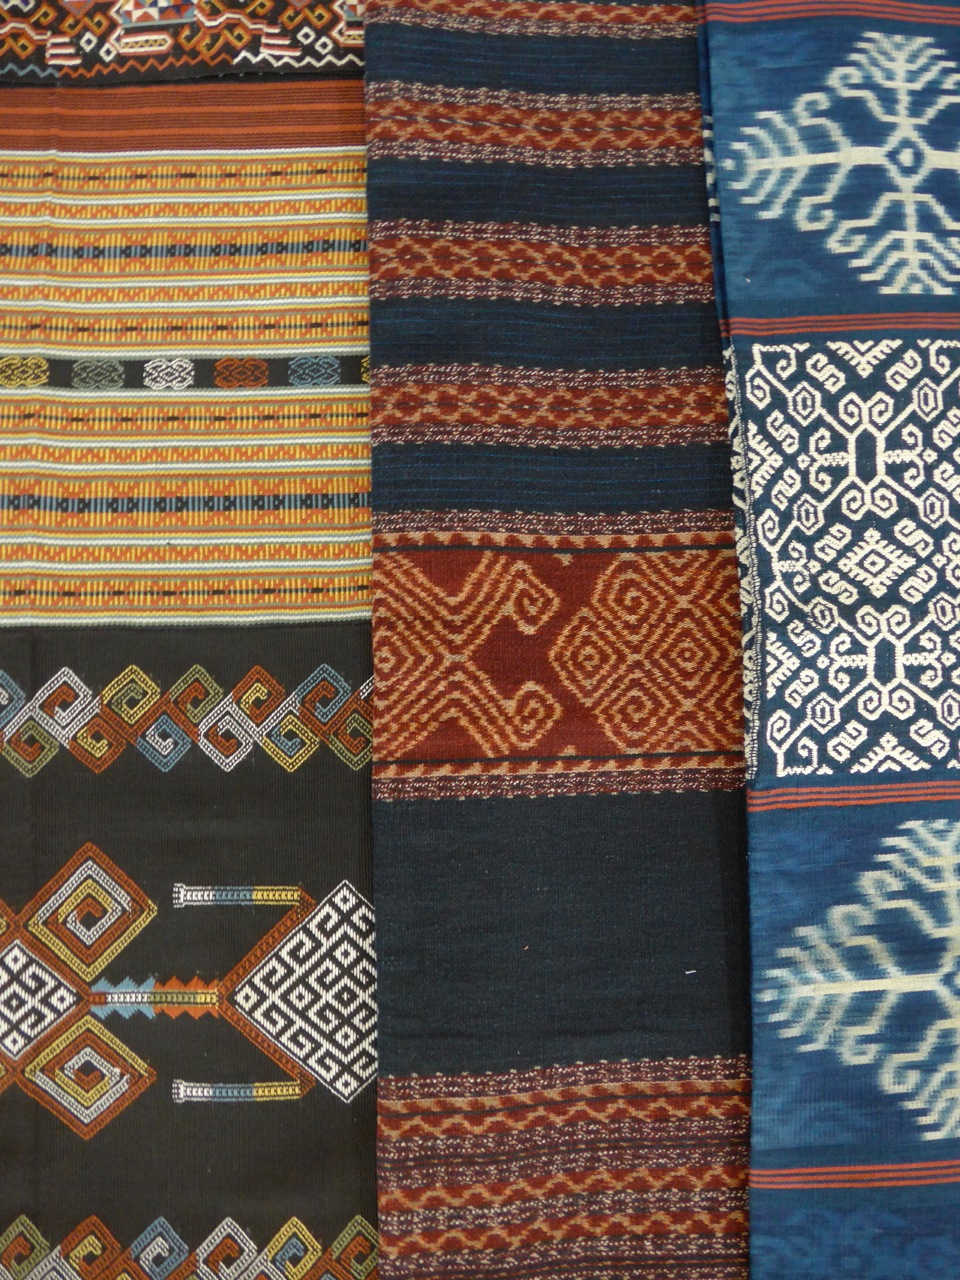 Exquisite textiles as wall art.jpeg